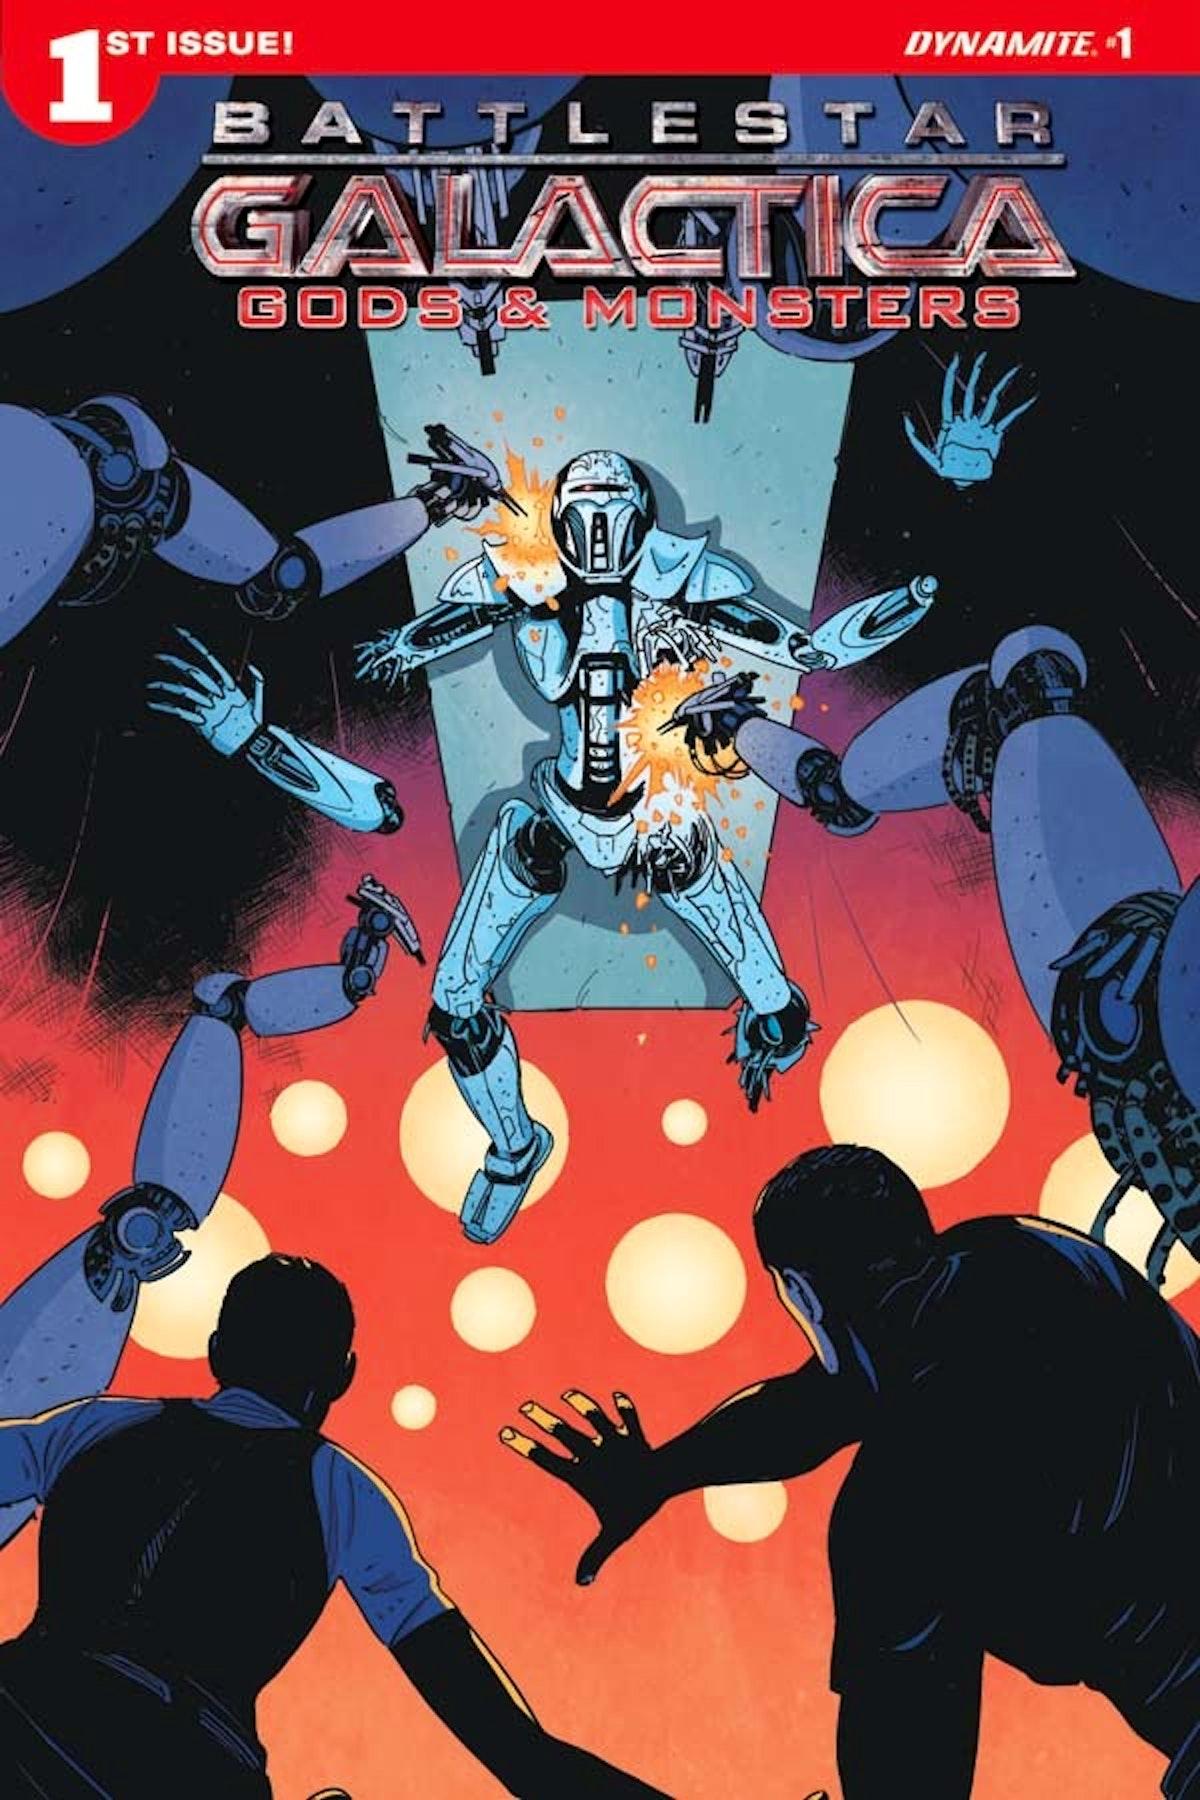 Battlestar Galactica: Gods and Monsters #1